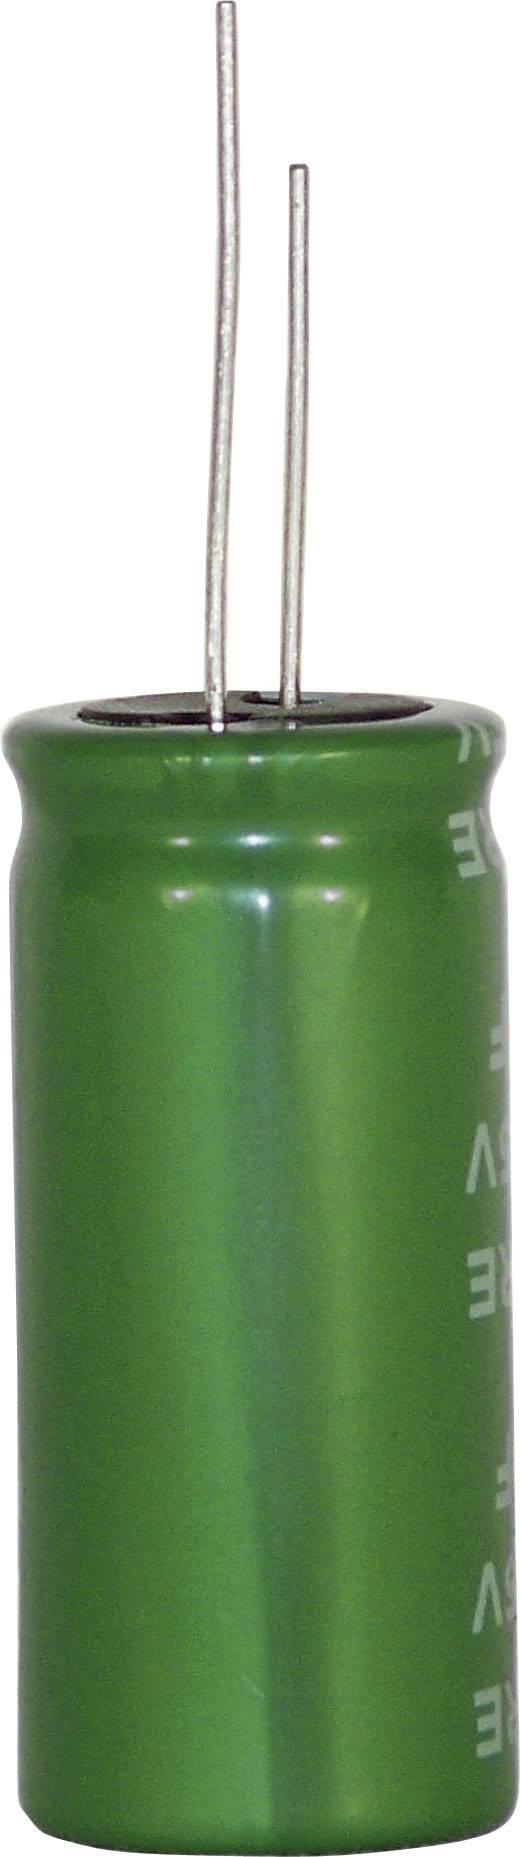 Kondenzátor elektrolytický 2vrstvý DDL155S05F2CRRDAPZ, 1,5 F, 5 V, 20 %, 17,5 x 9 x 23,5 mm